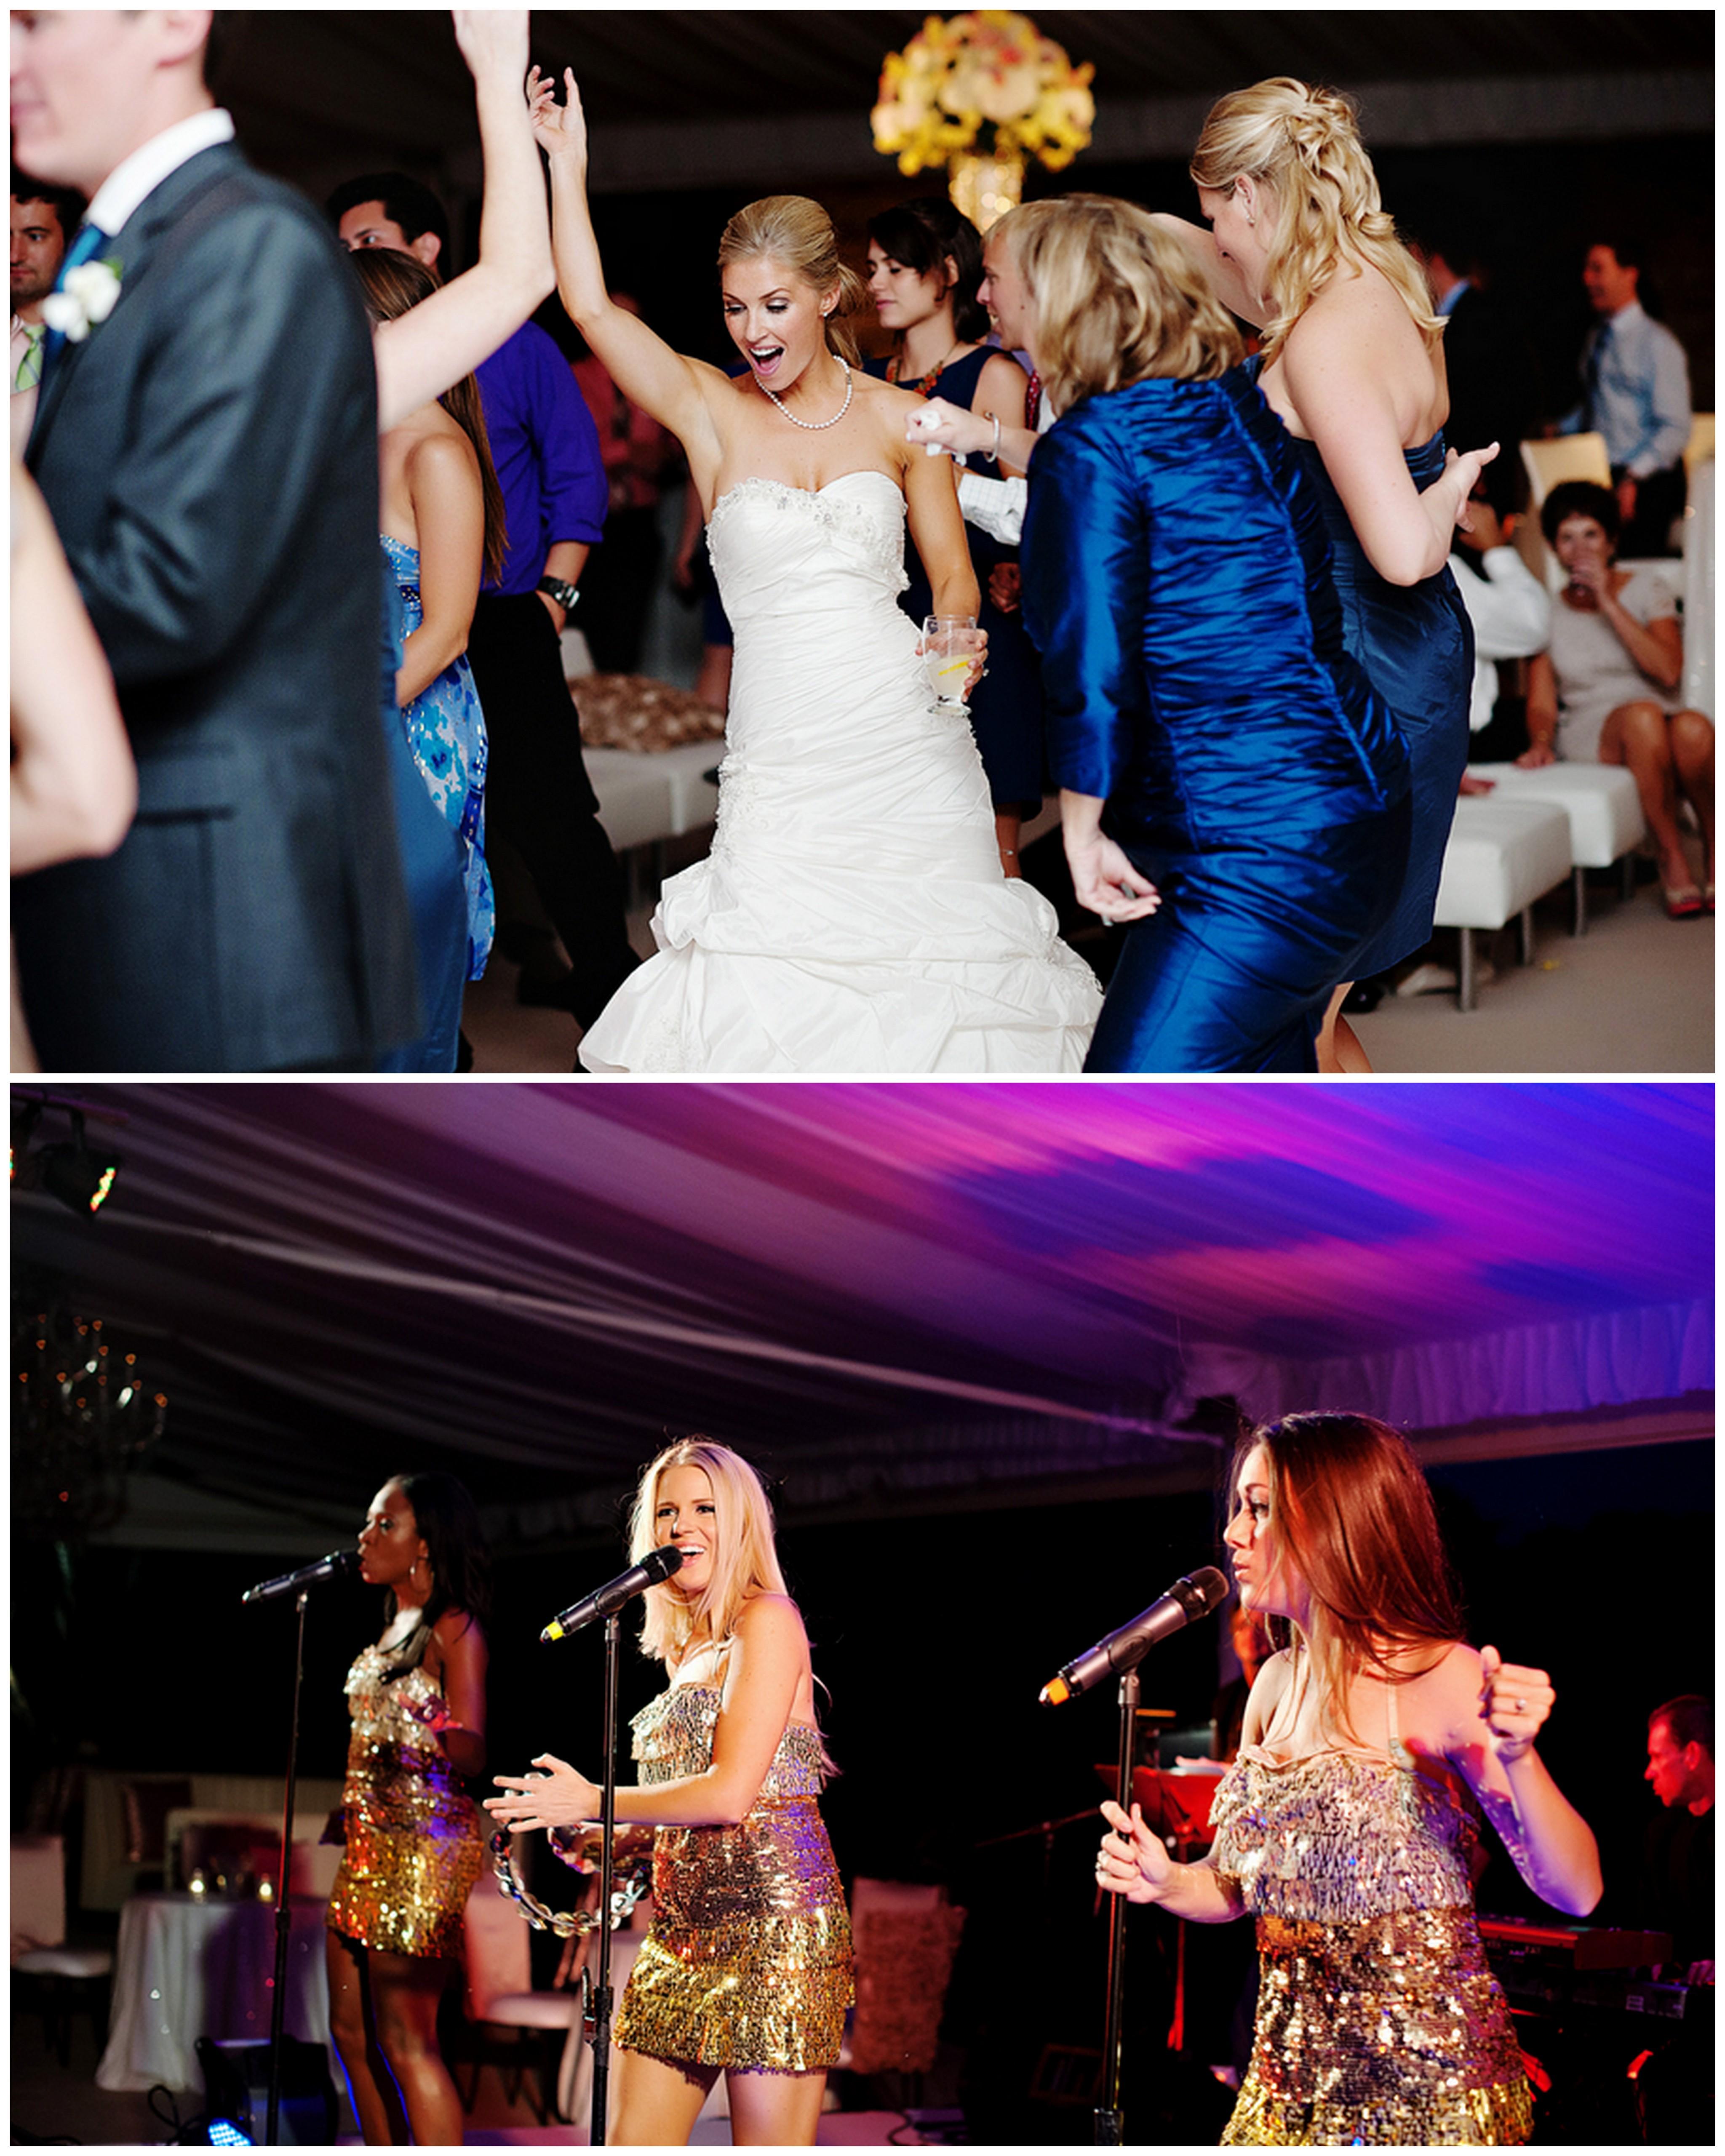 viva bella events   Dora Manuel   Cincinnati Wedding Planner   dancing   wedding band